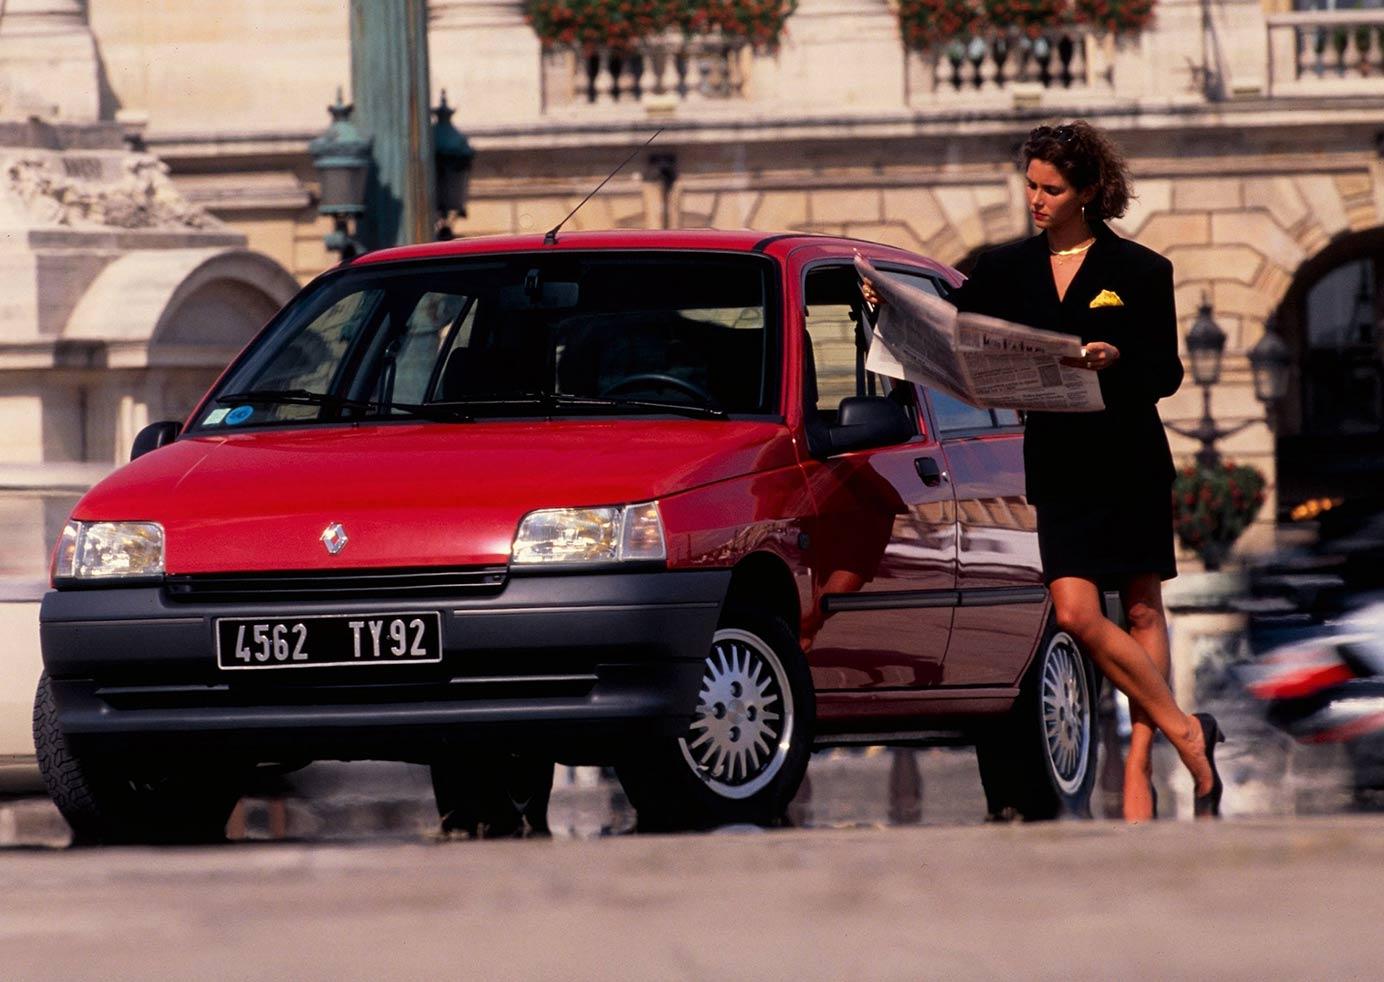 RENAULT CLIO 16s WEB